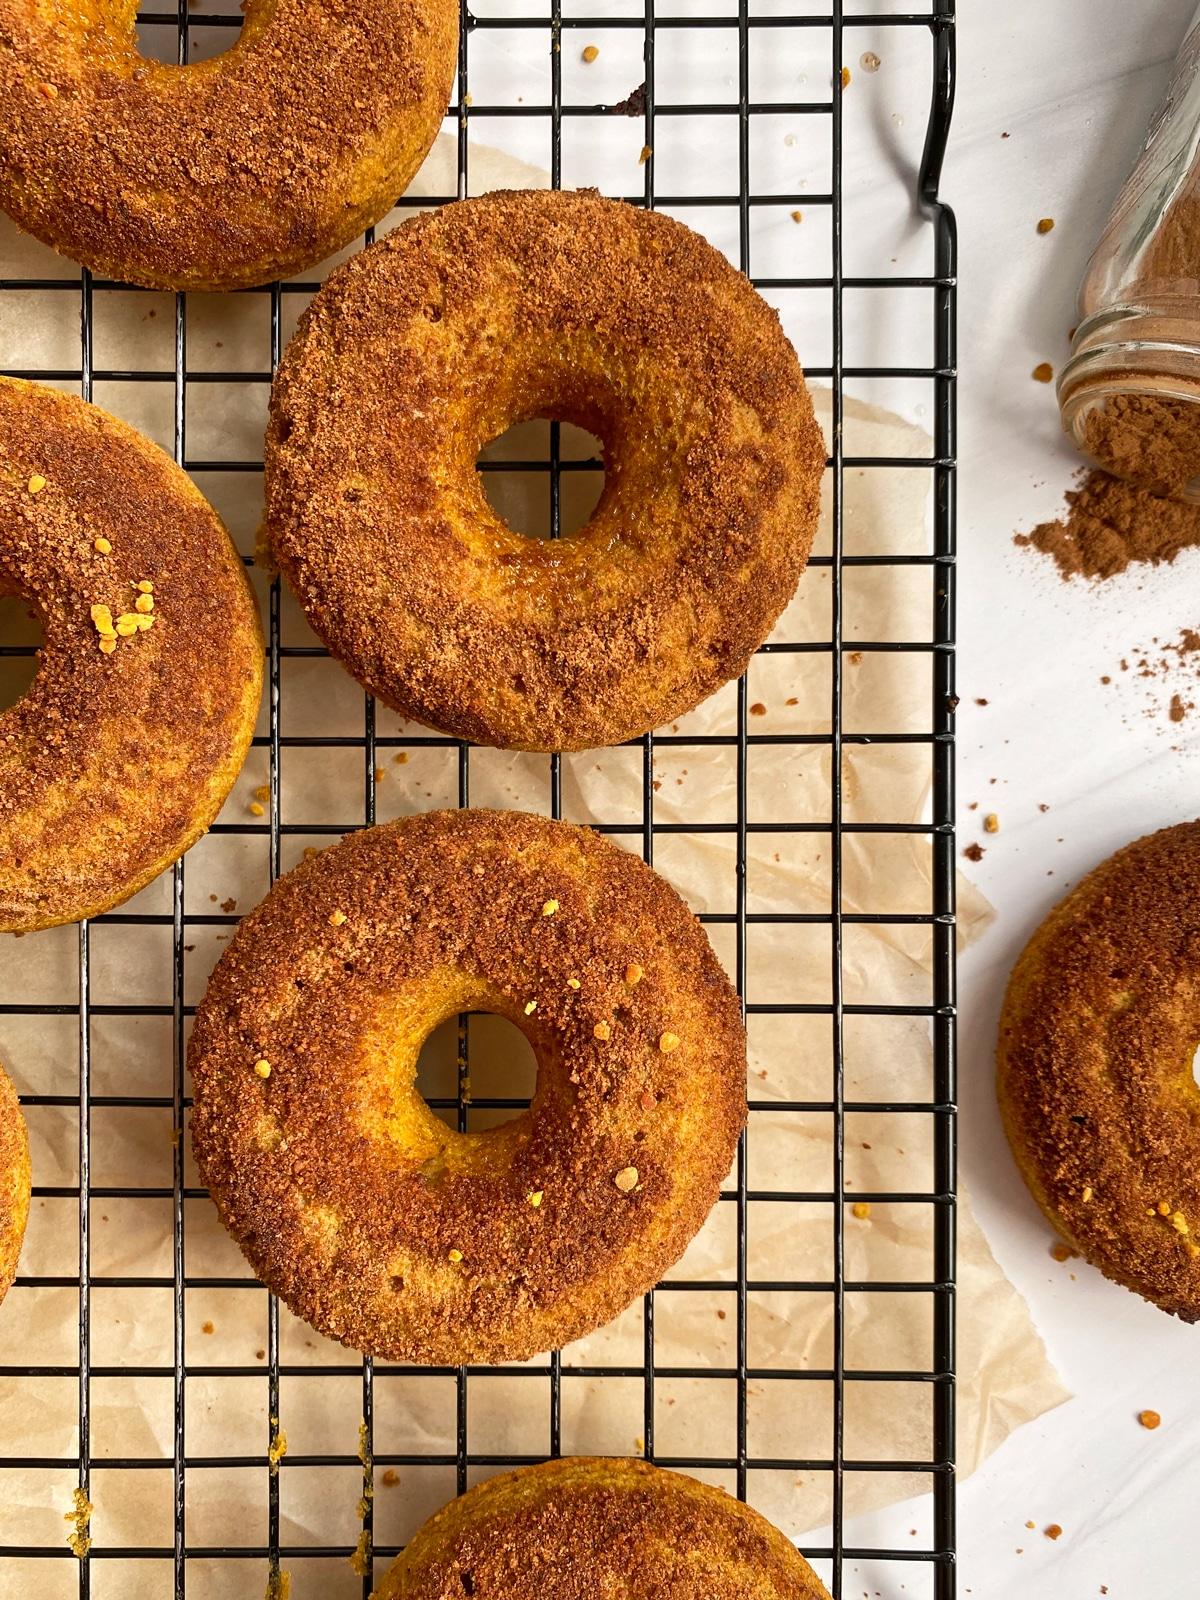 tigernut-flour-donuts-top-view